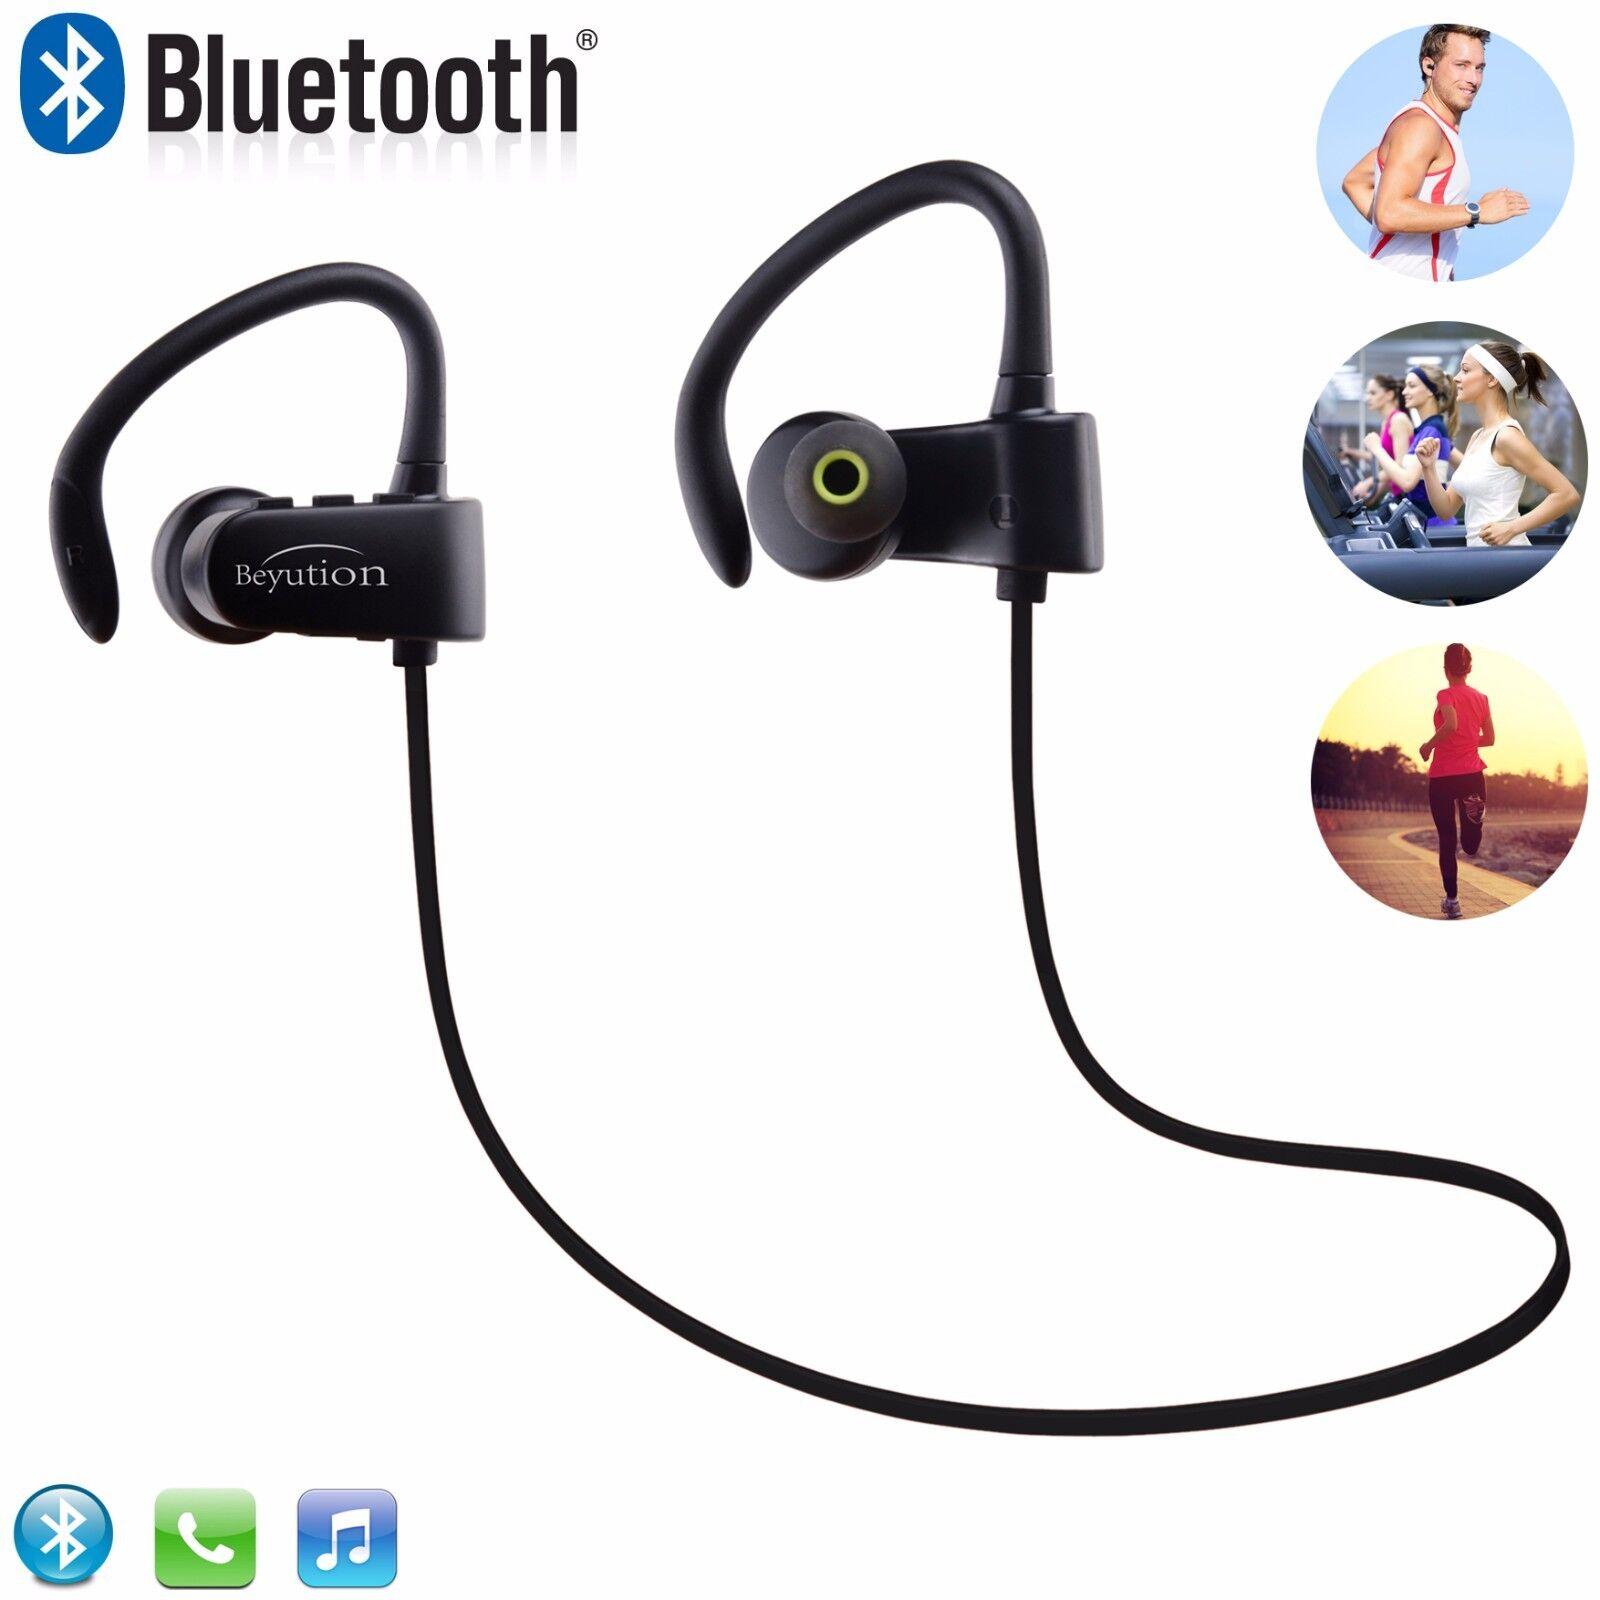 HiFi Stereo BLUETOOTH HEADPHONES bluetooth headphone ...